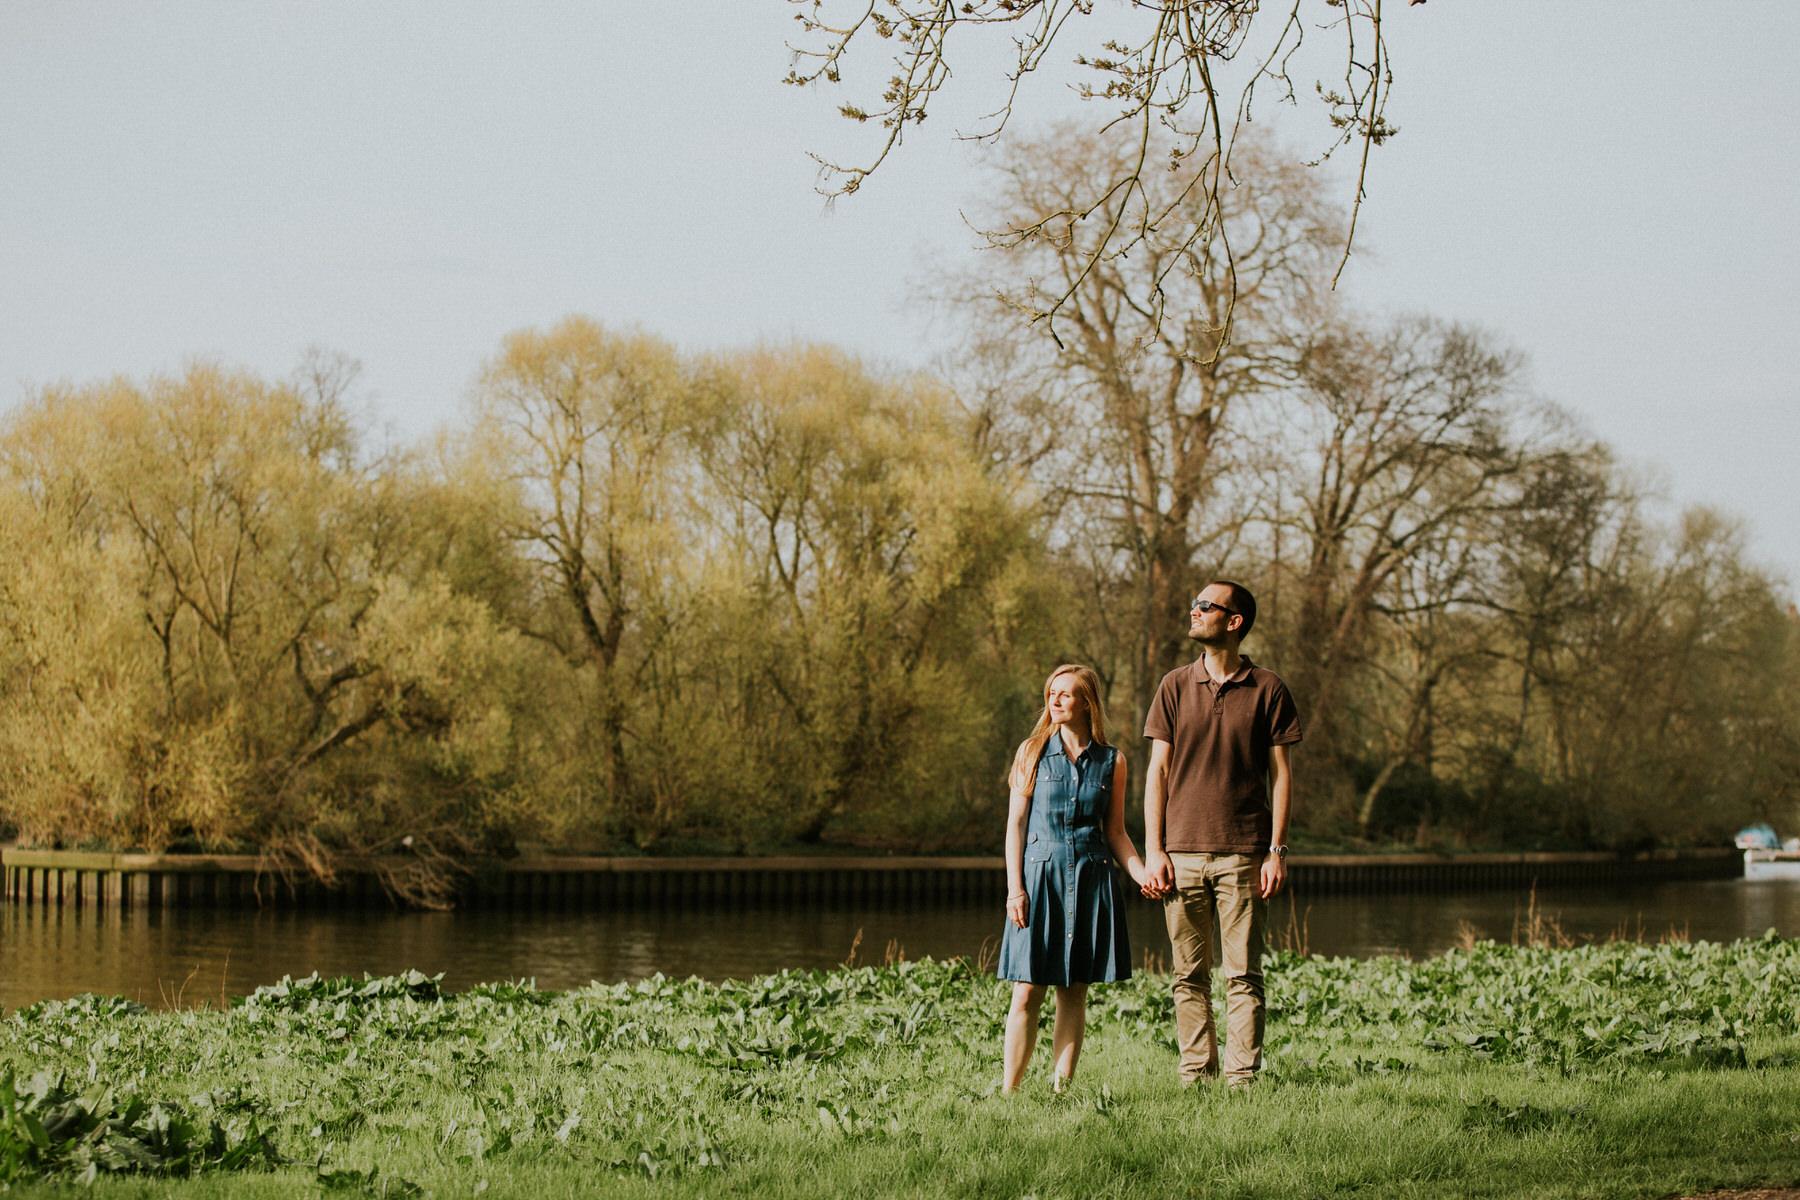 35-romantic unposed pre-wedding photography London.jpg